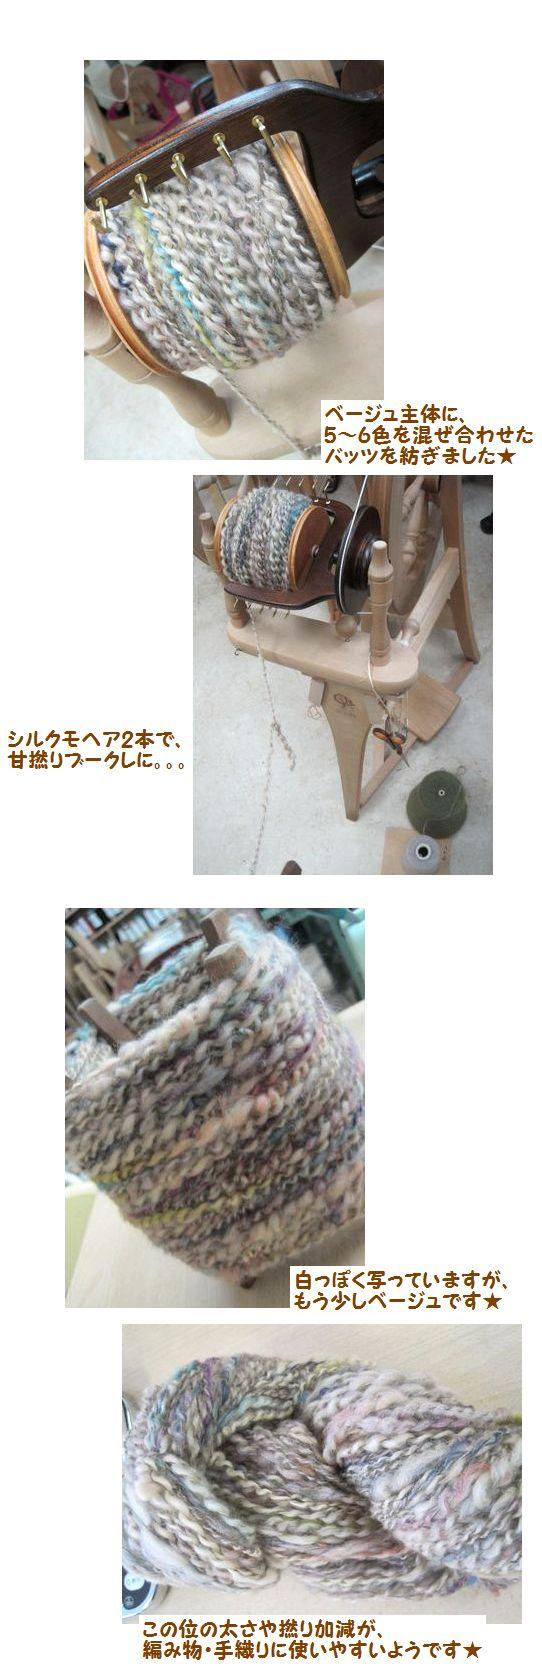 c0221884_0253220.jpg